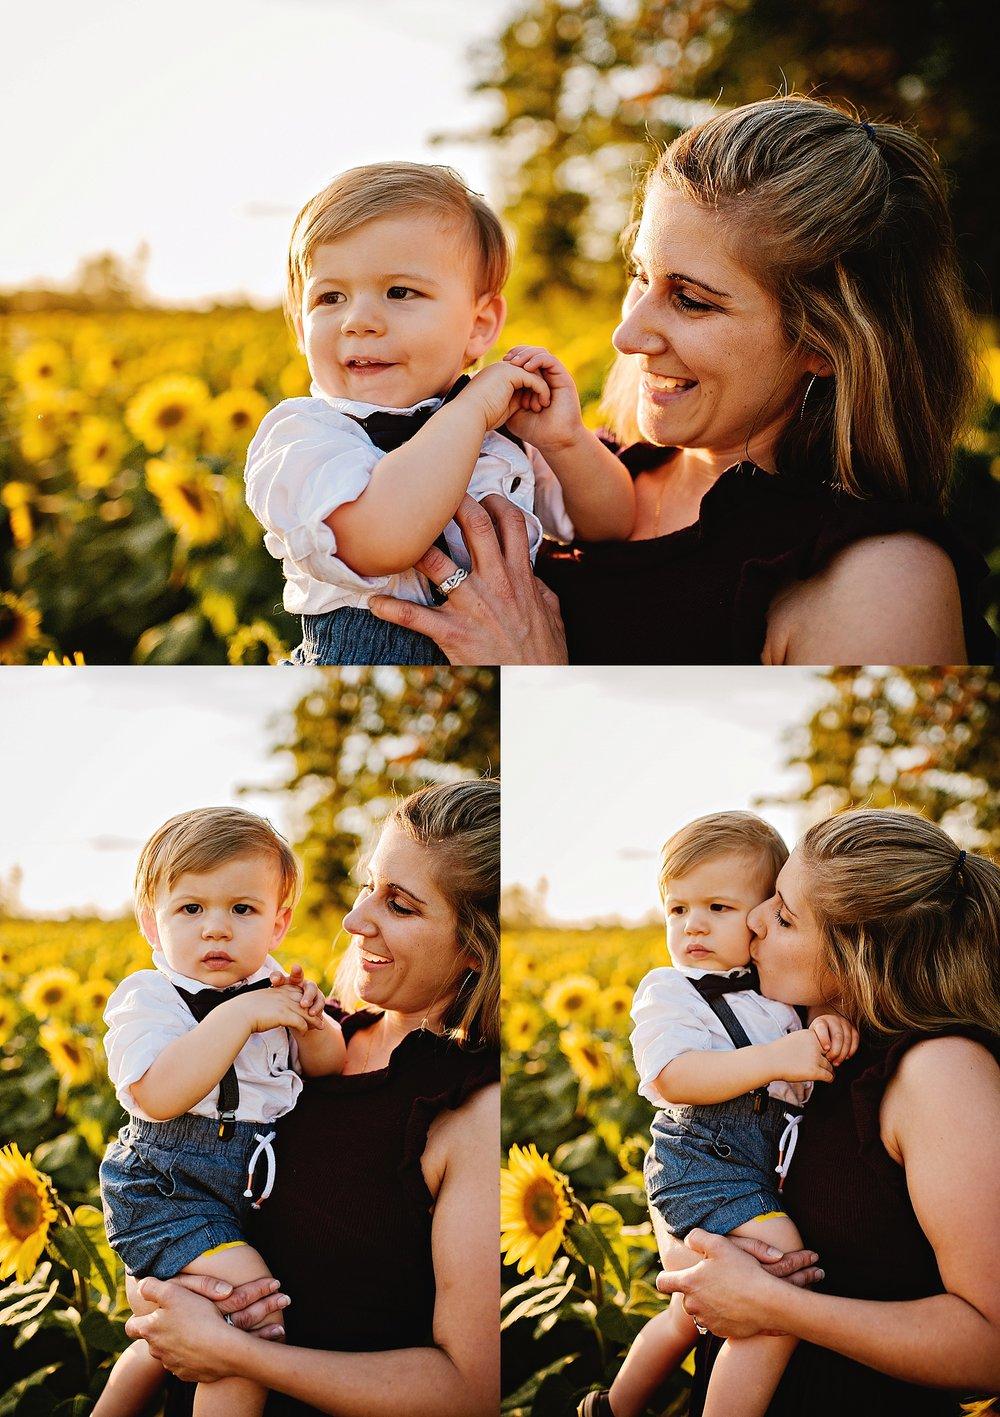 Schreiner-family-lauren-grayson-cleveland-photographer-sunflower-field-session_0022.jpg